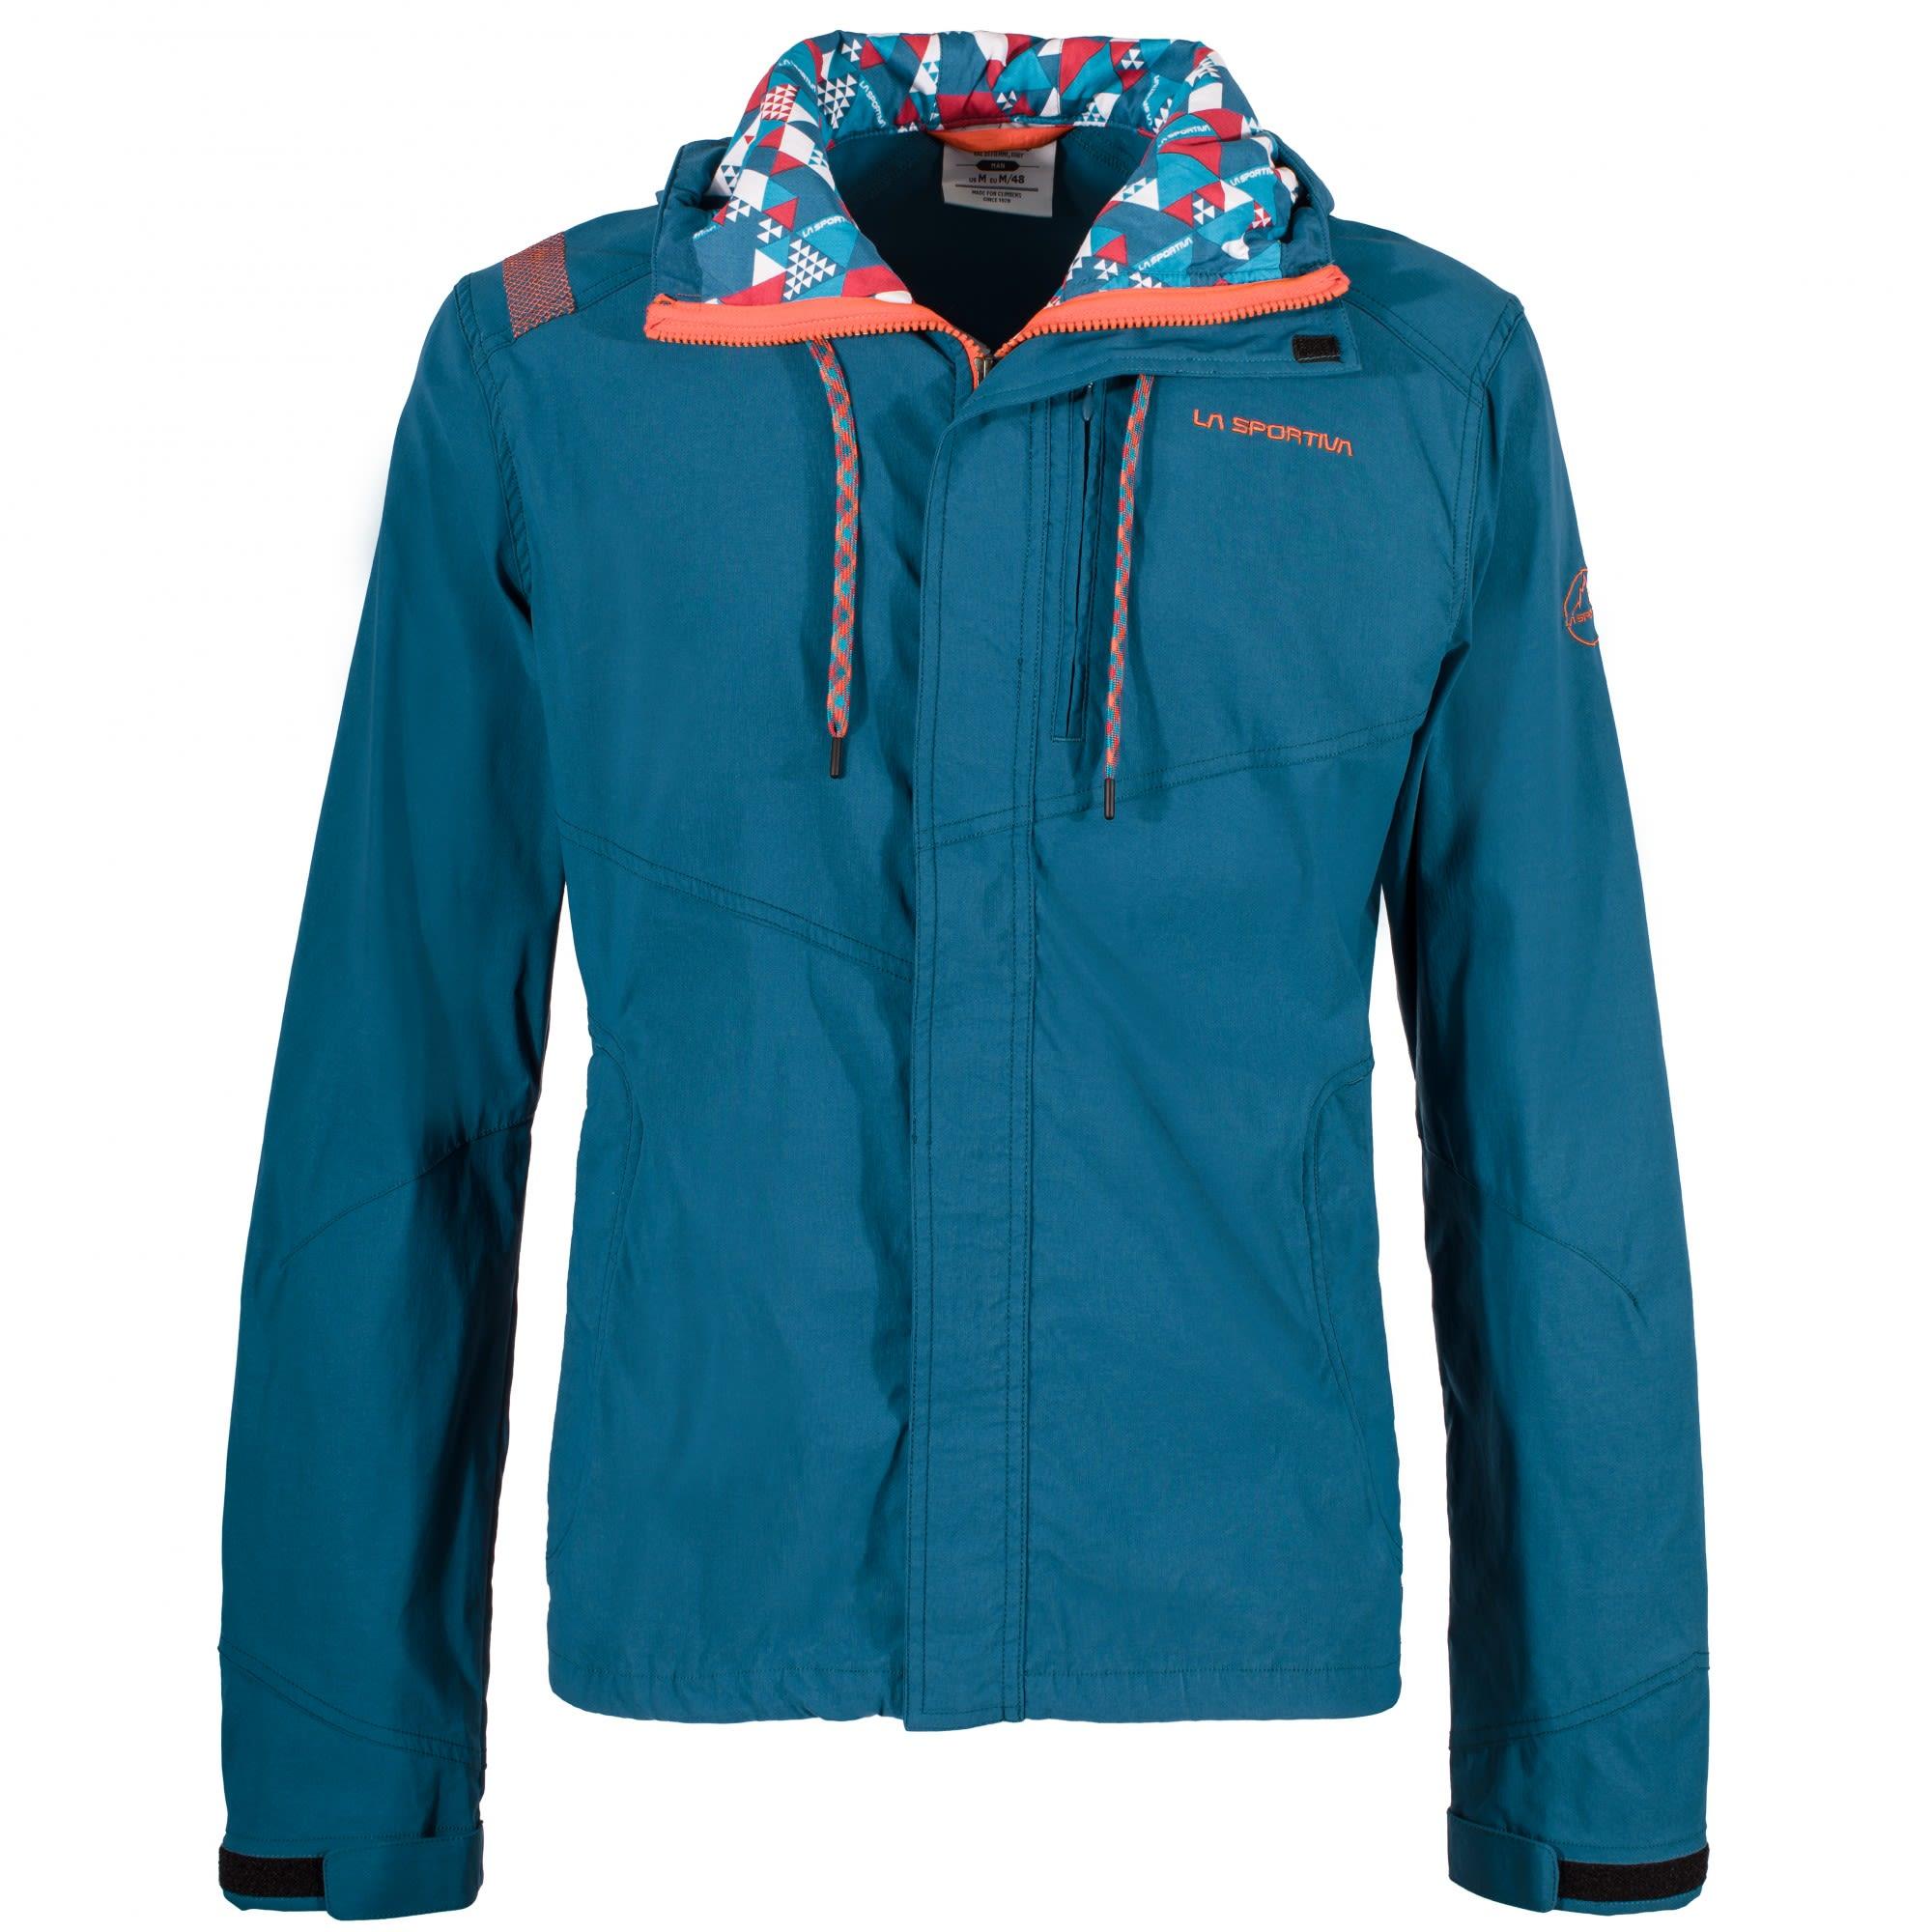 La Sportiva M Grade Jacket | Größe S,M,L,XL,XXL | Herren Freizeitjacke